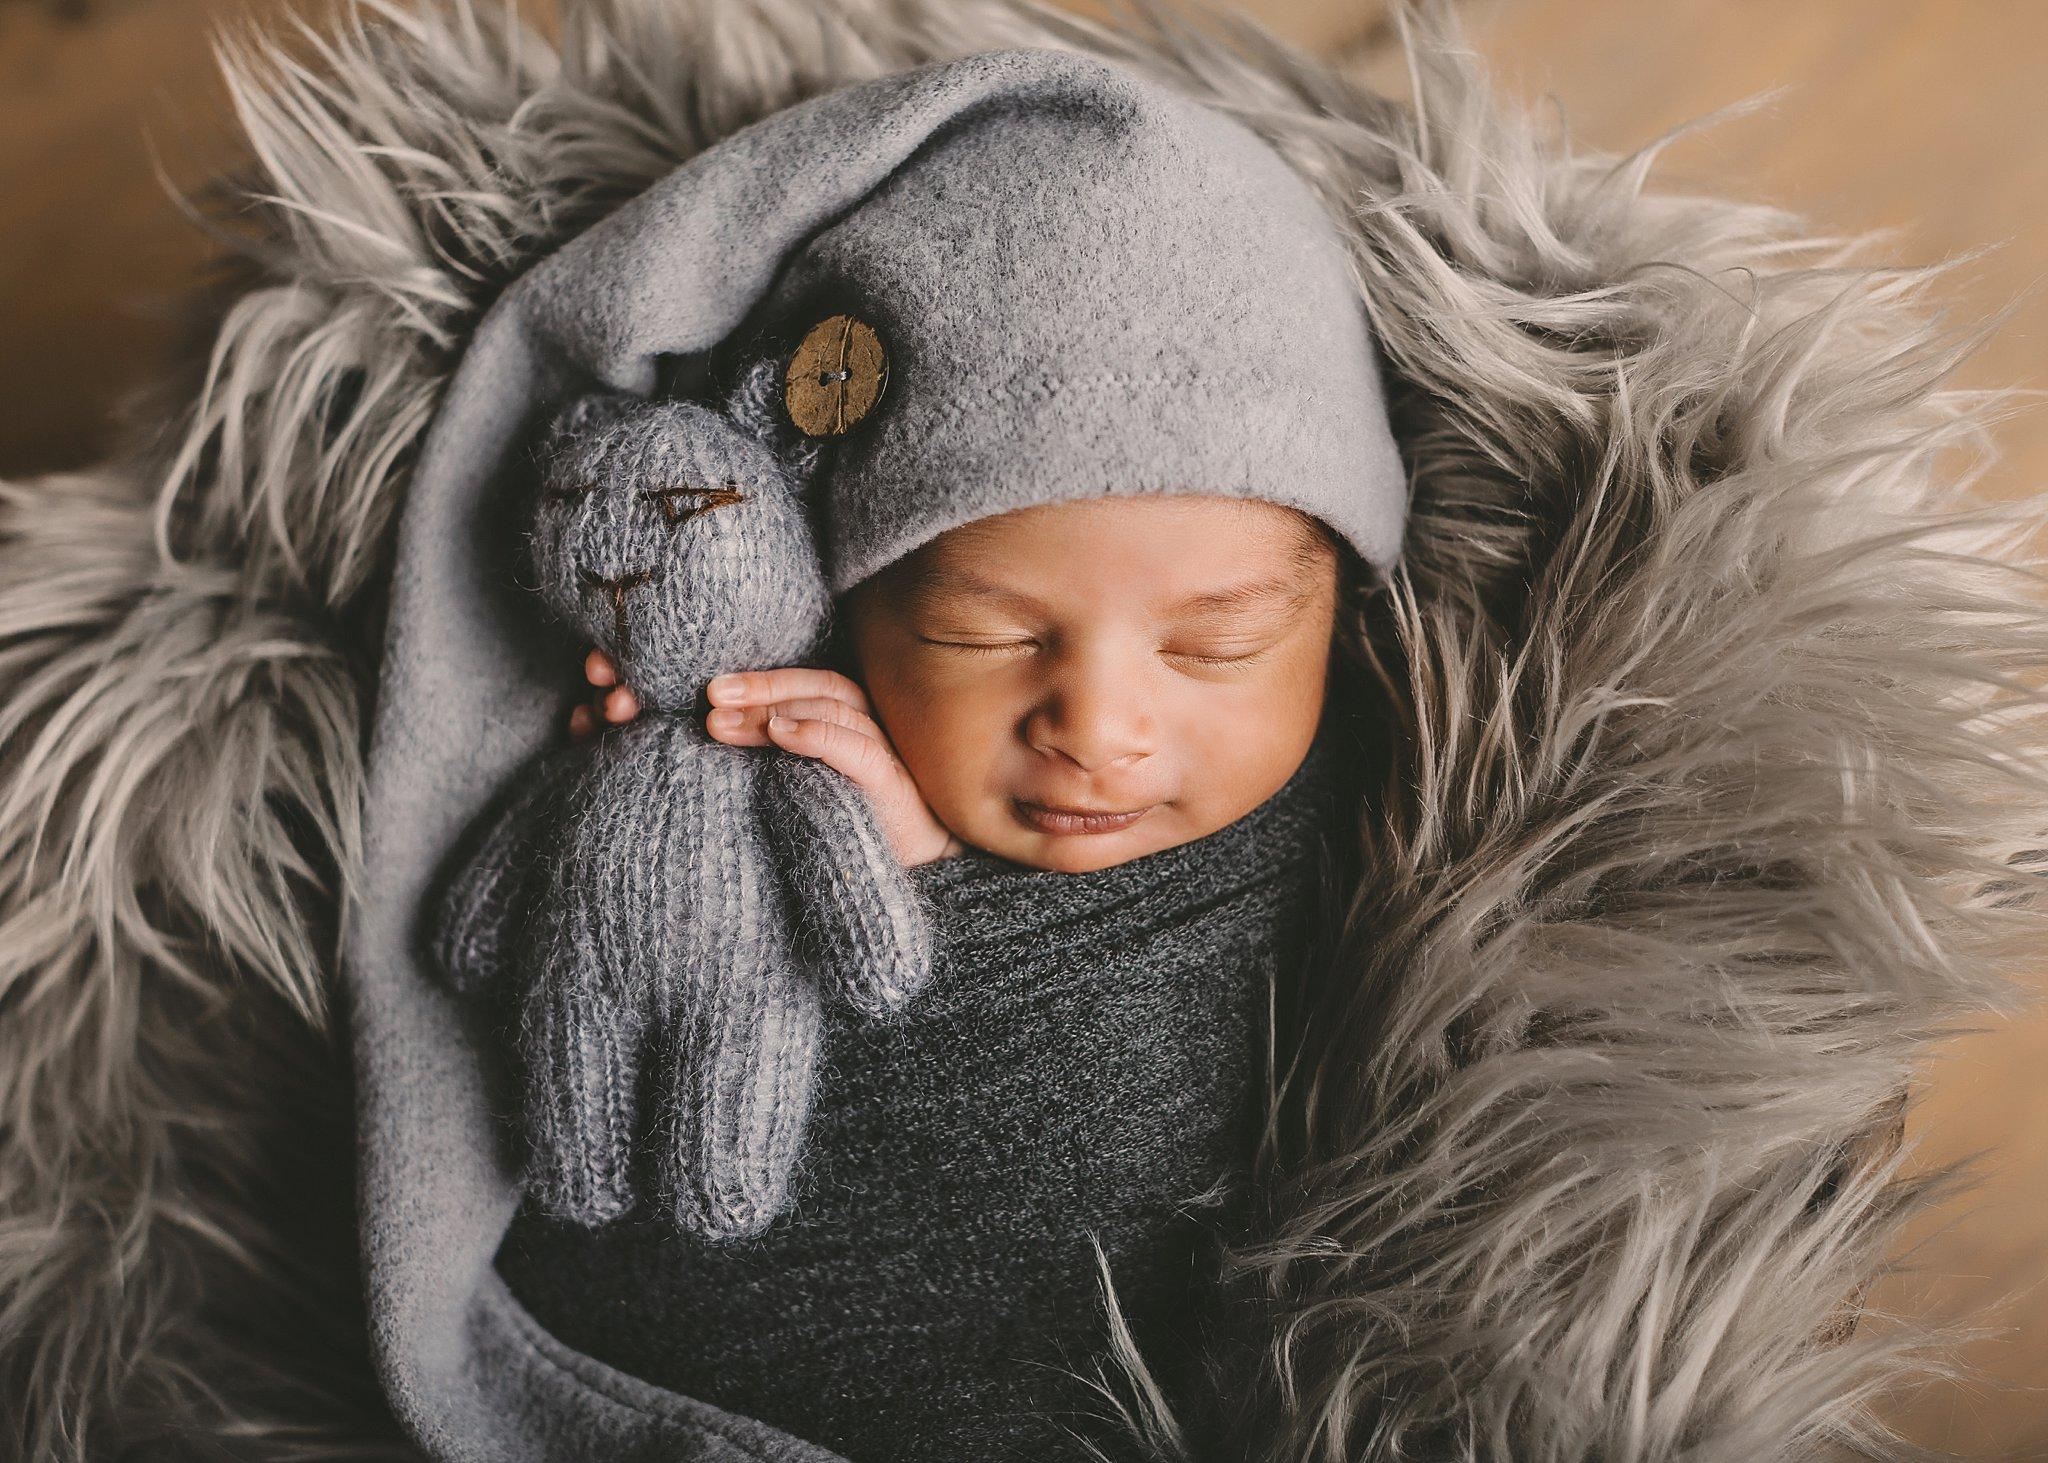 Worcester Newborn Photographer Best Boston Massachusetts Millbury Baby BOY Photos_0079.jpg